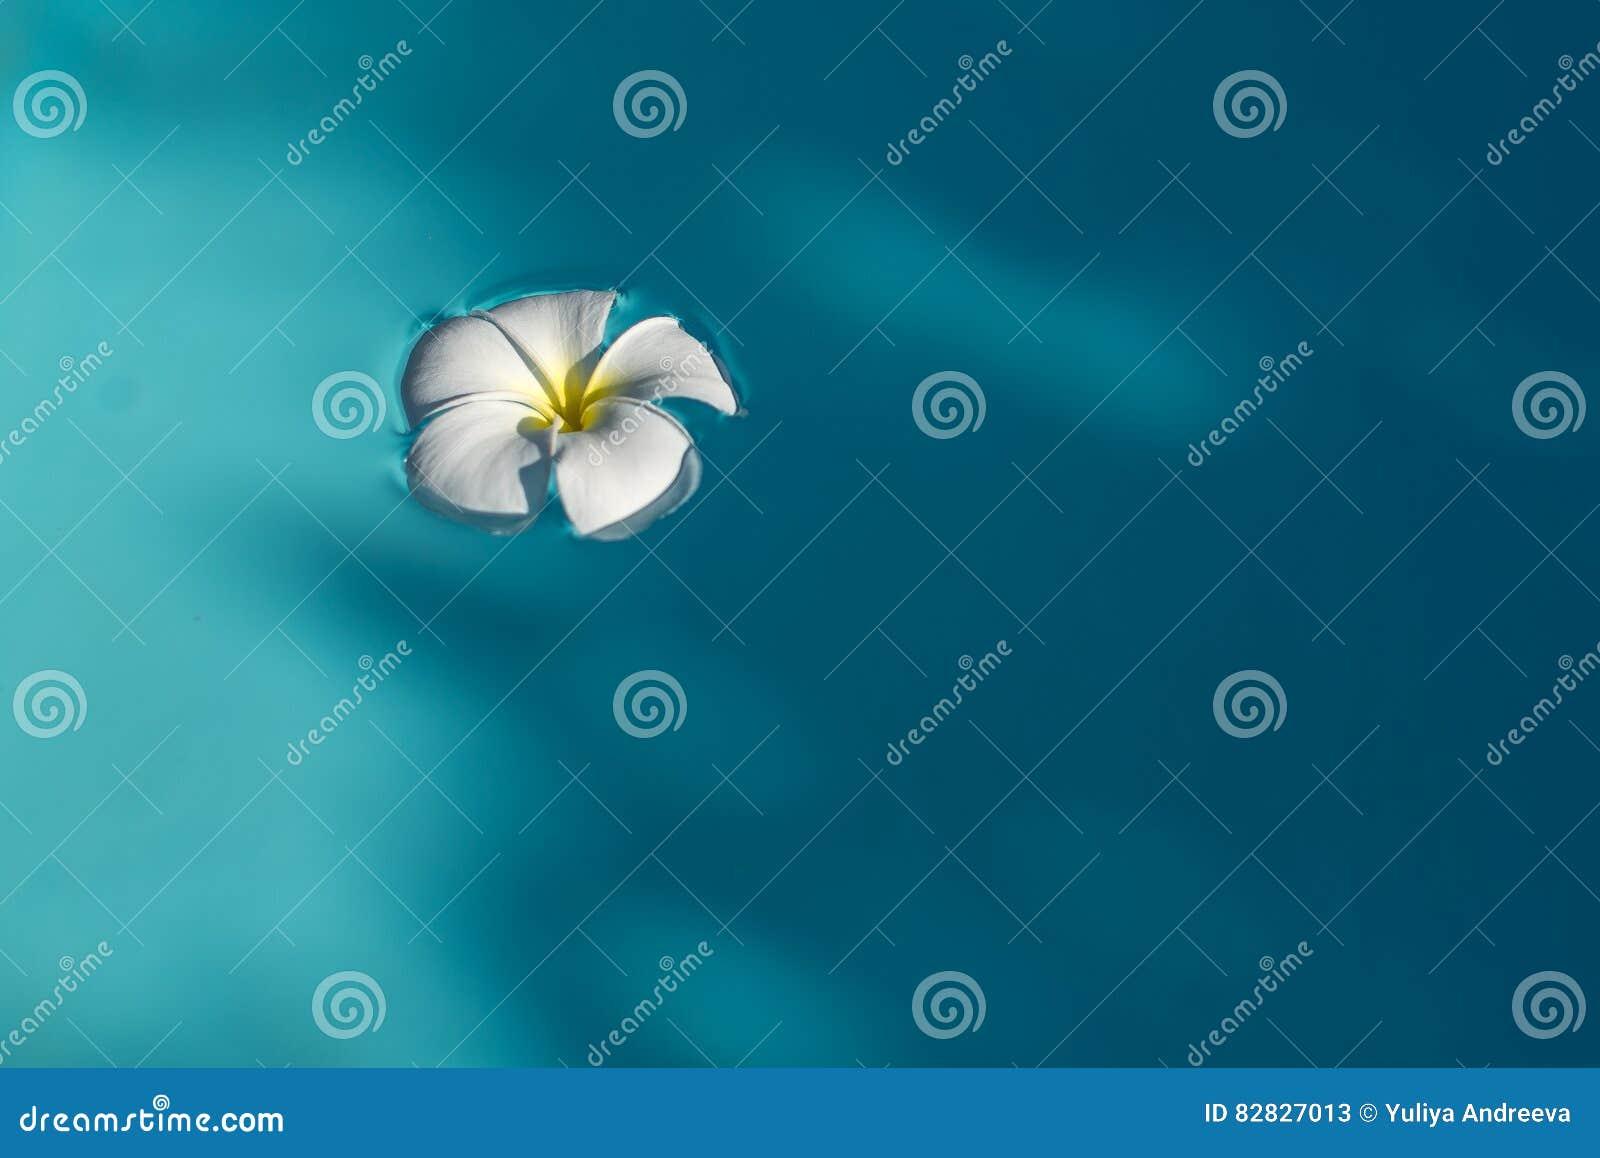 White plumeria flower in blue water stock image image of blossom download white plumeria flower in blue water stock image image of blossom flowers izmirmasajfo